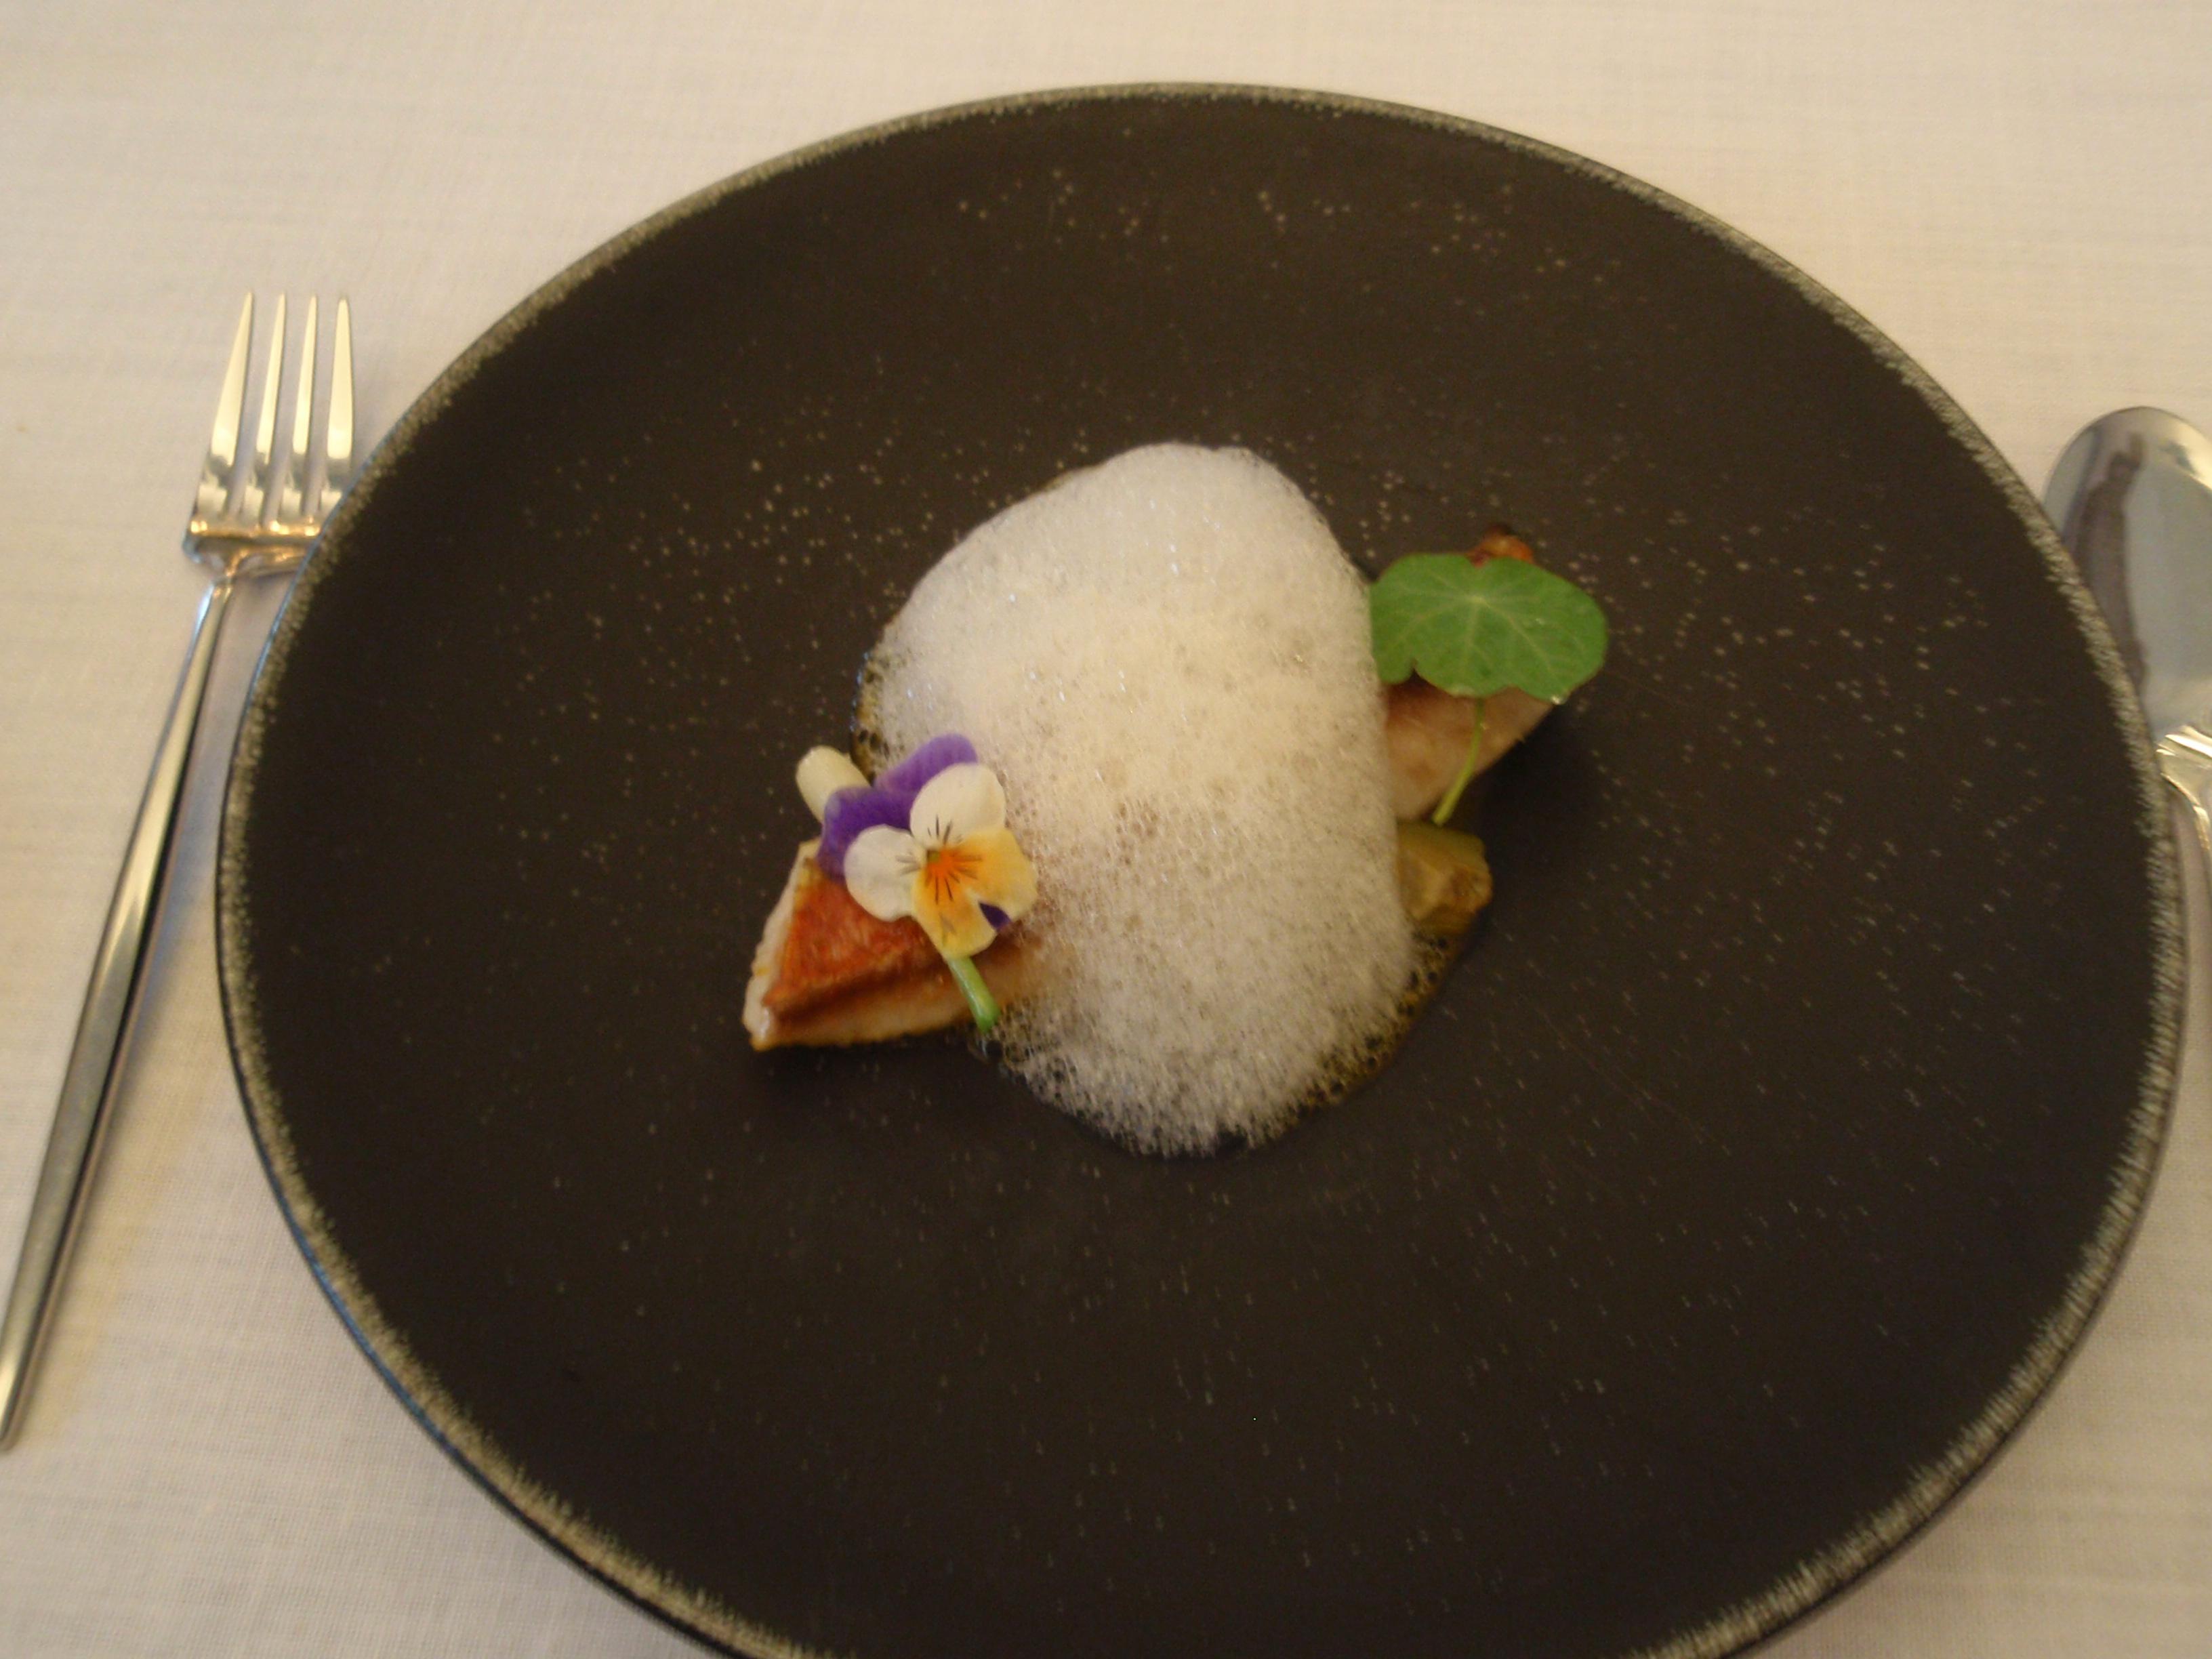 Restaurante en Madrid Lomo de salmonete en caldo corto de azafrán